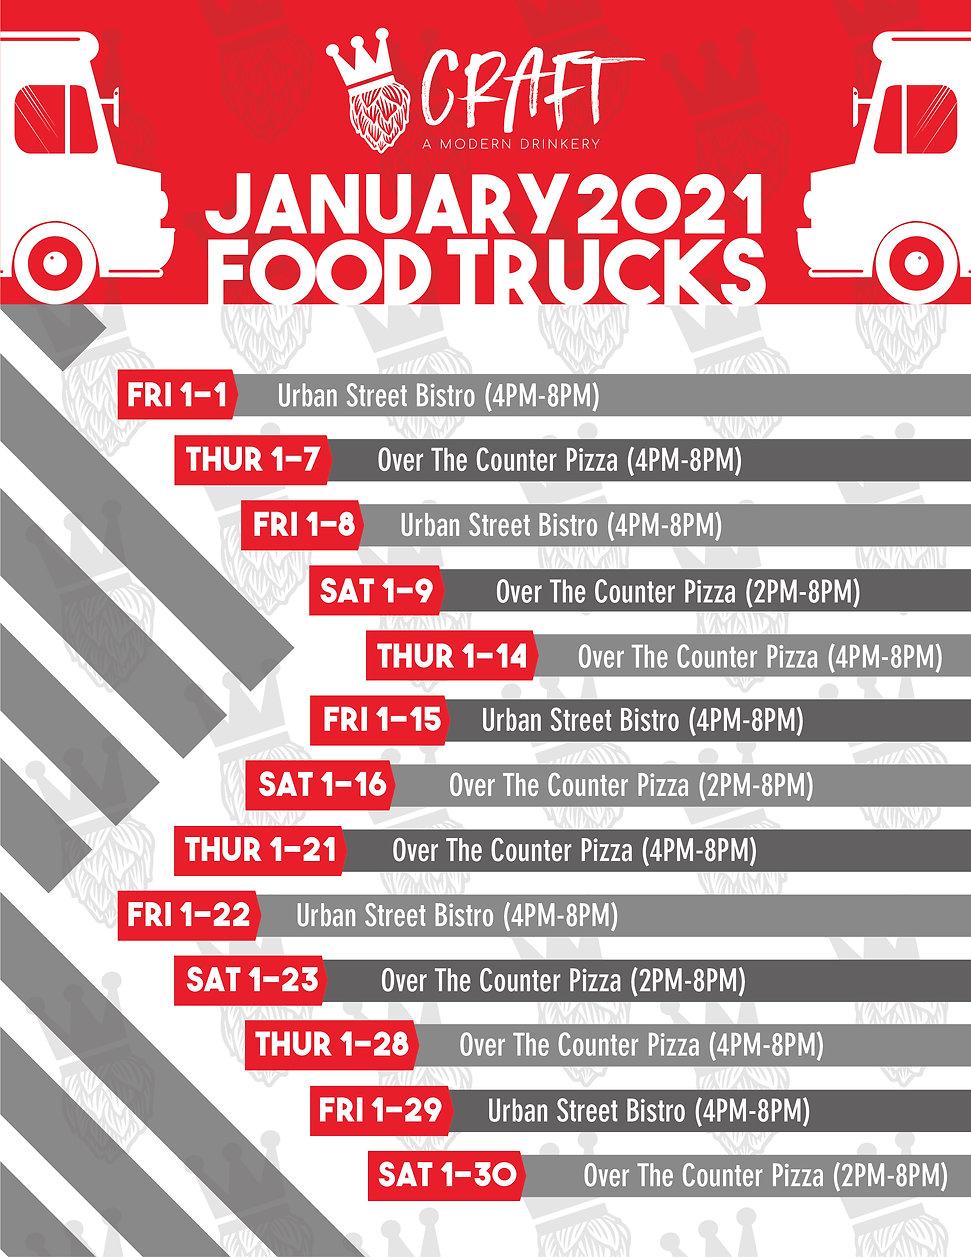 January 2021 Food Truck Flyer.jpg